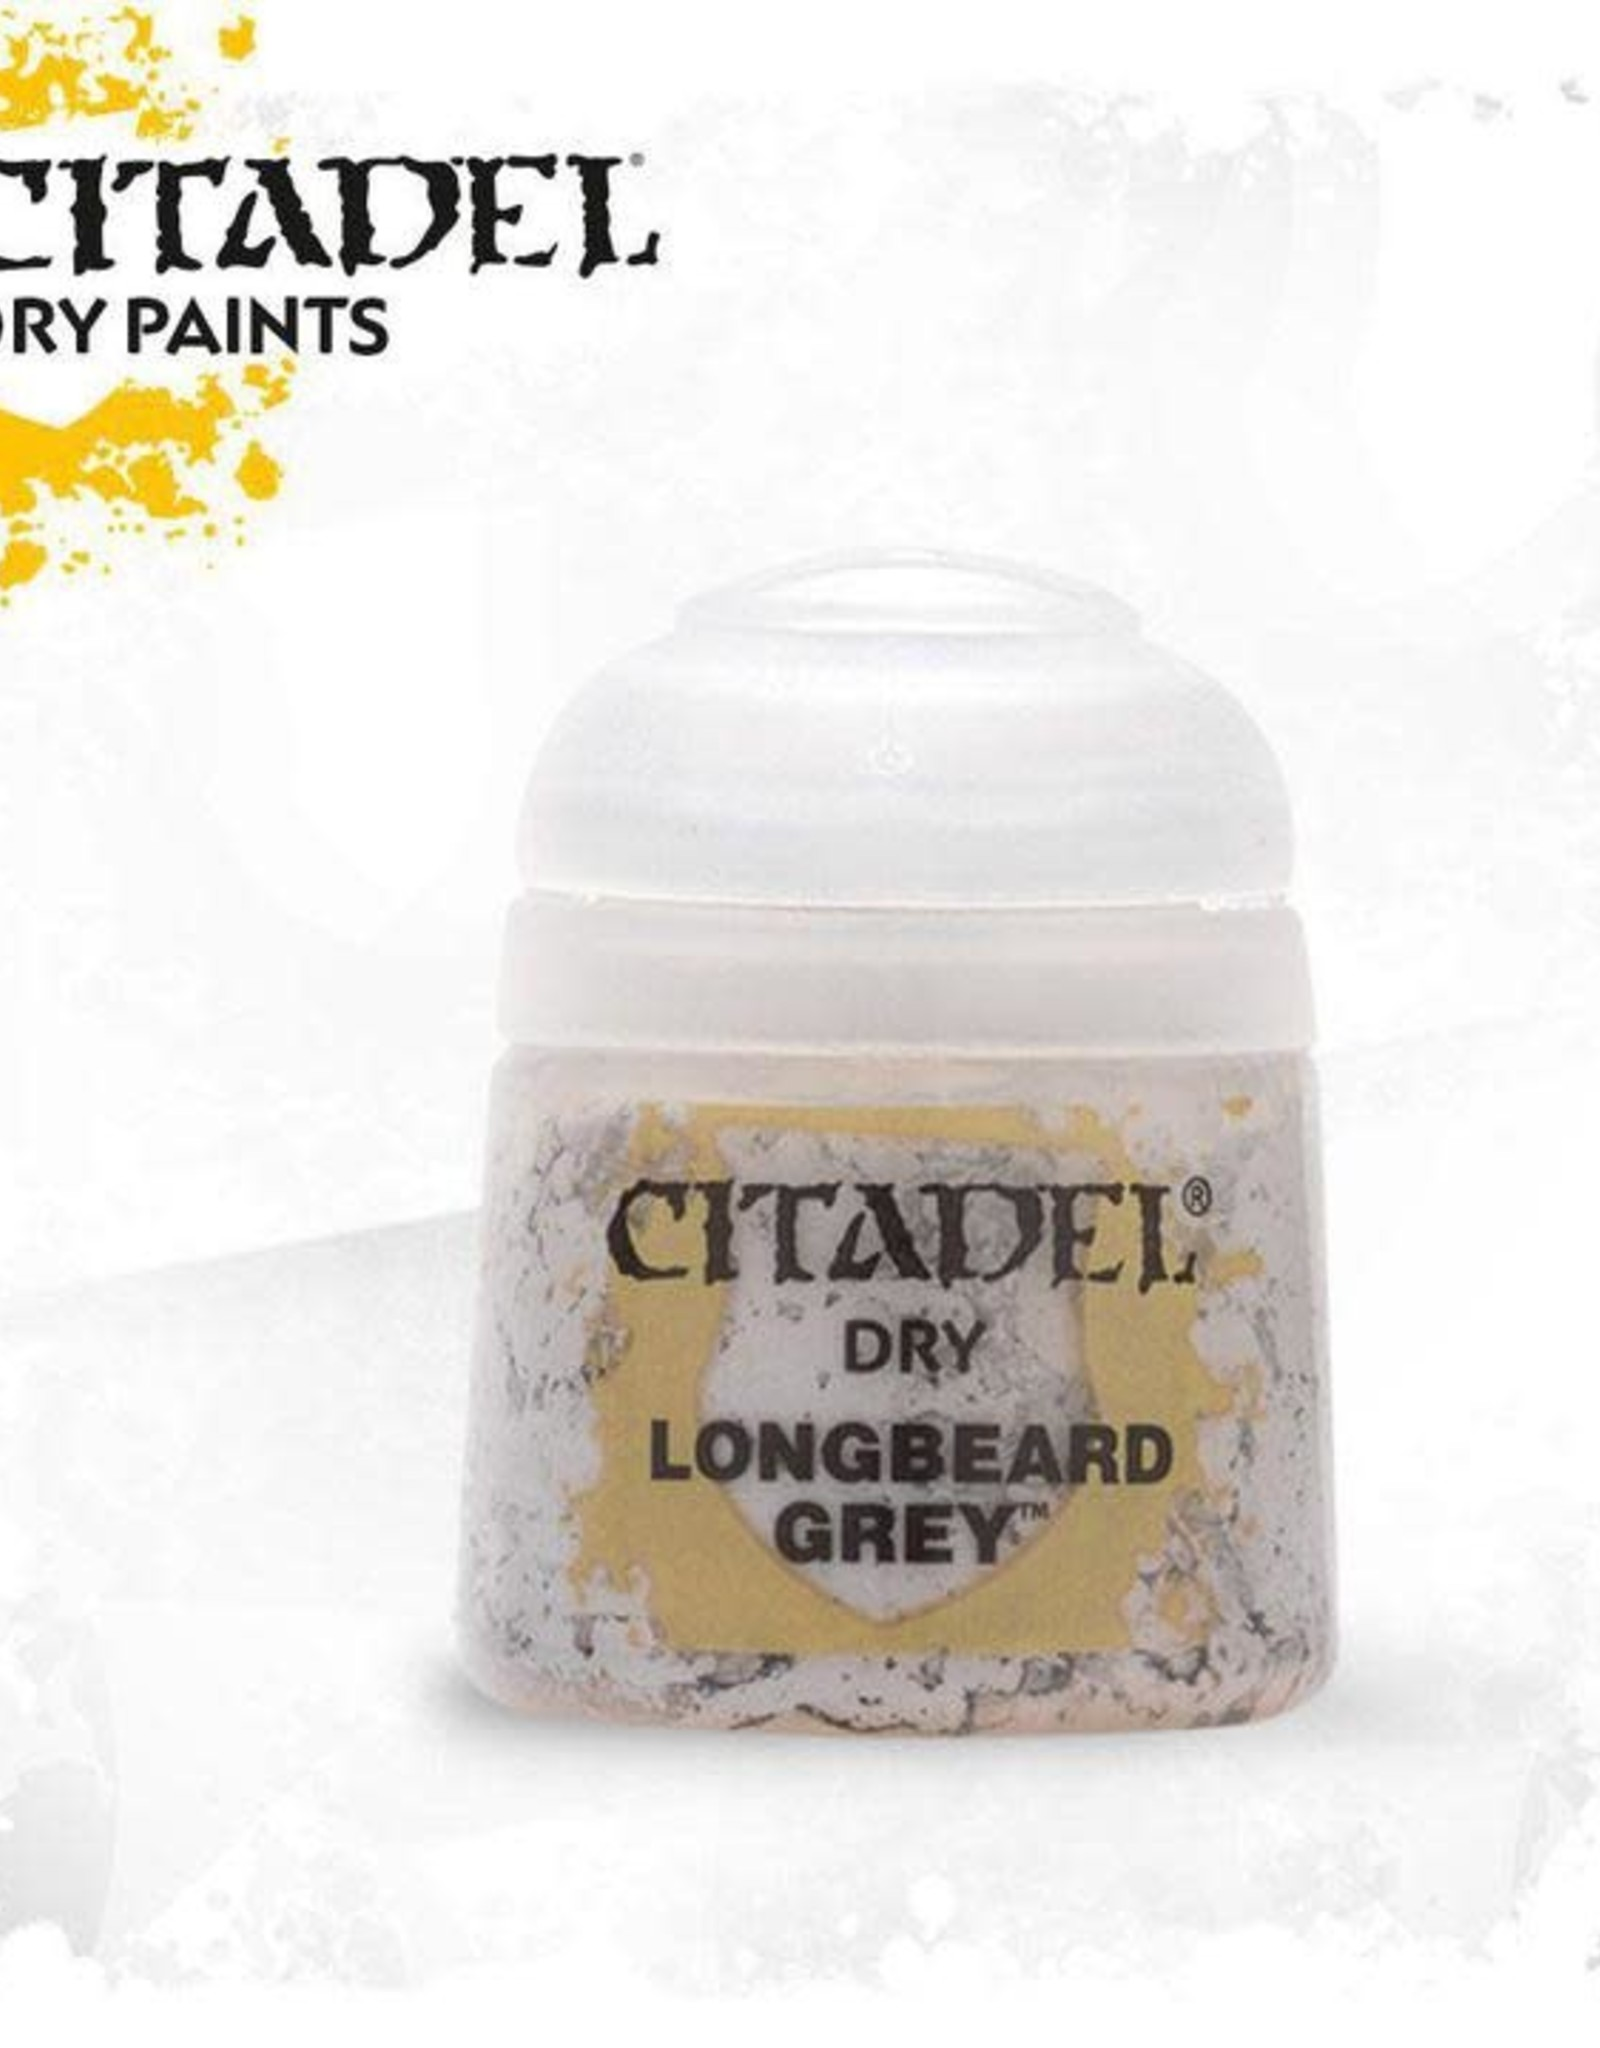 Games Workshop Citadel Paint: Dry - Longbeard Grey